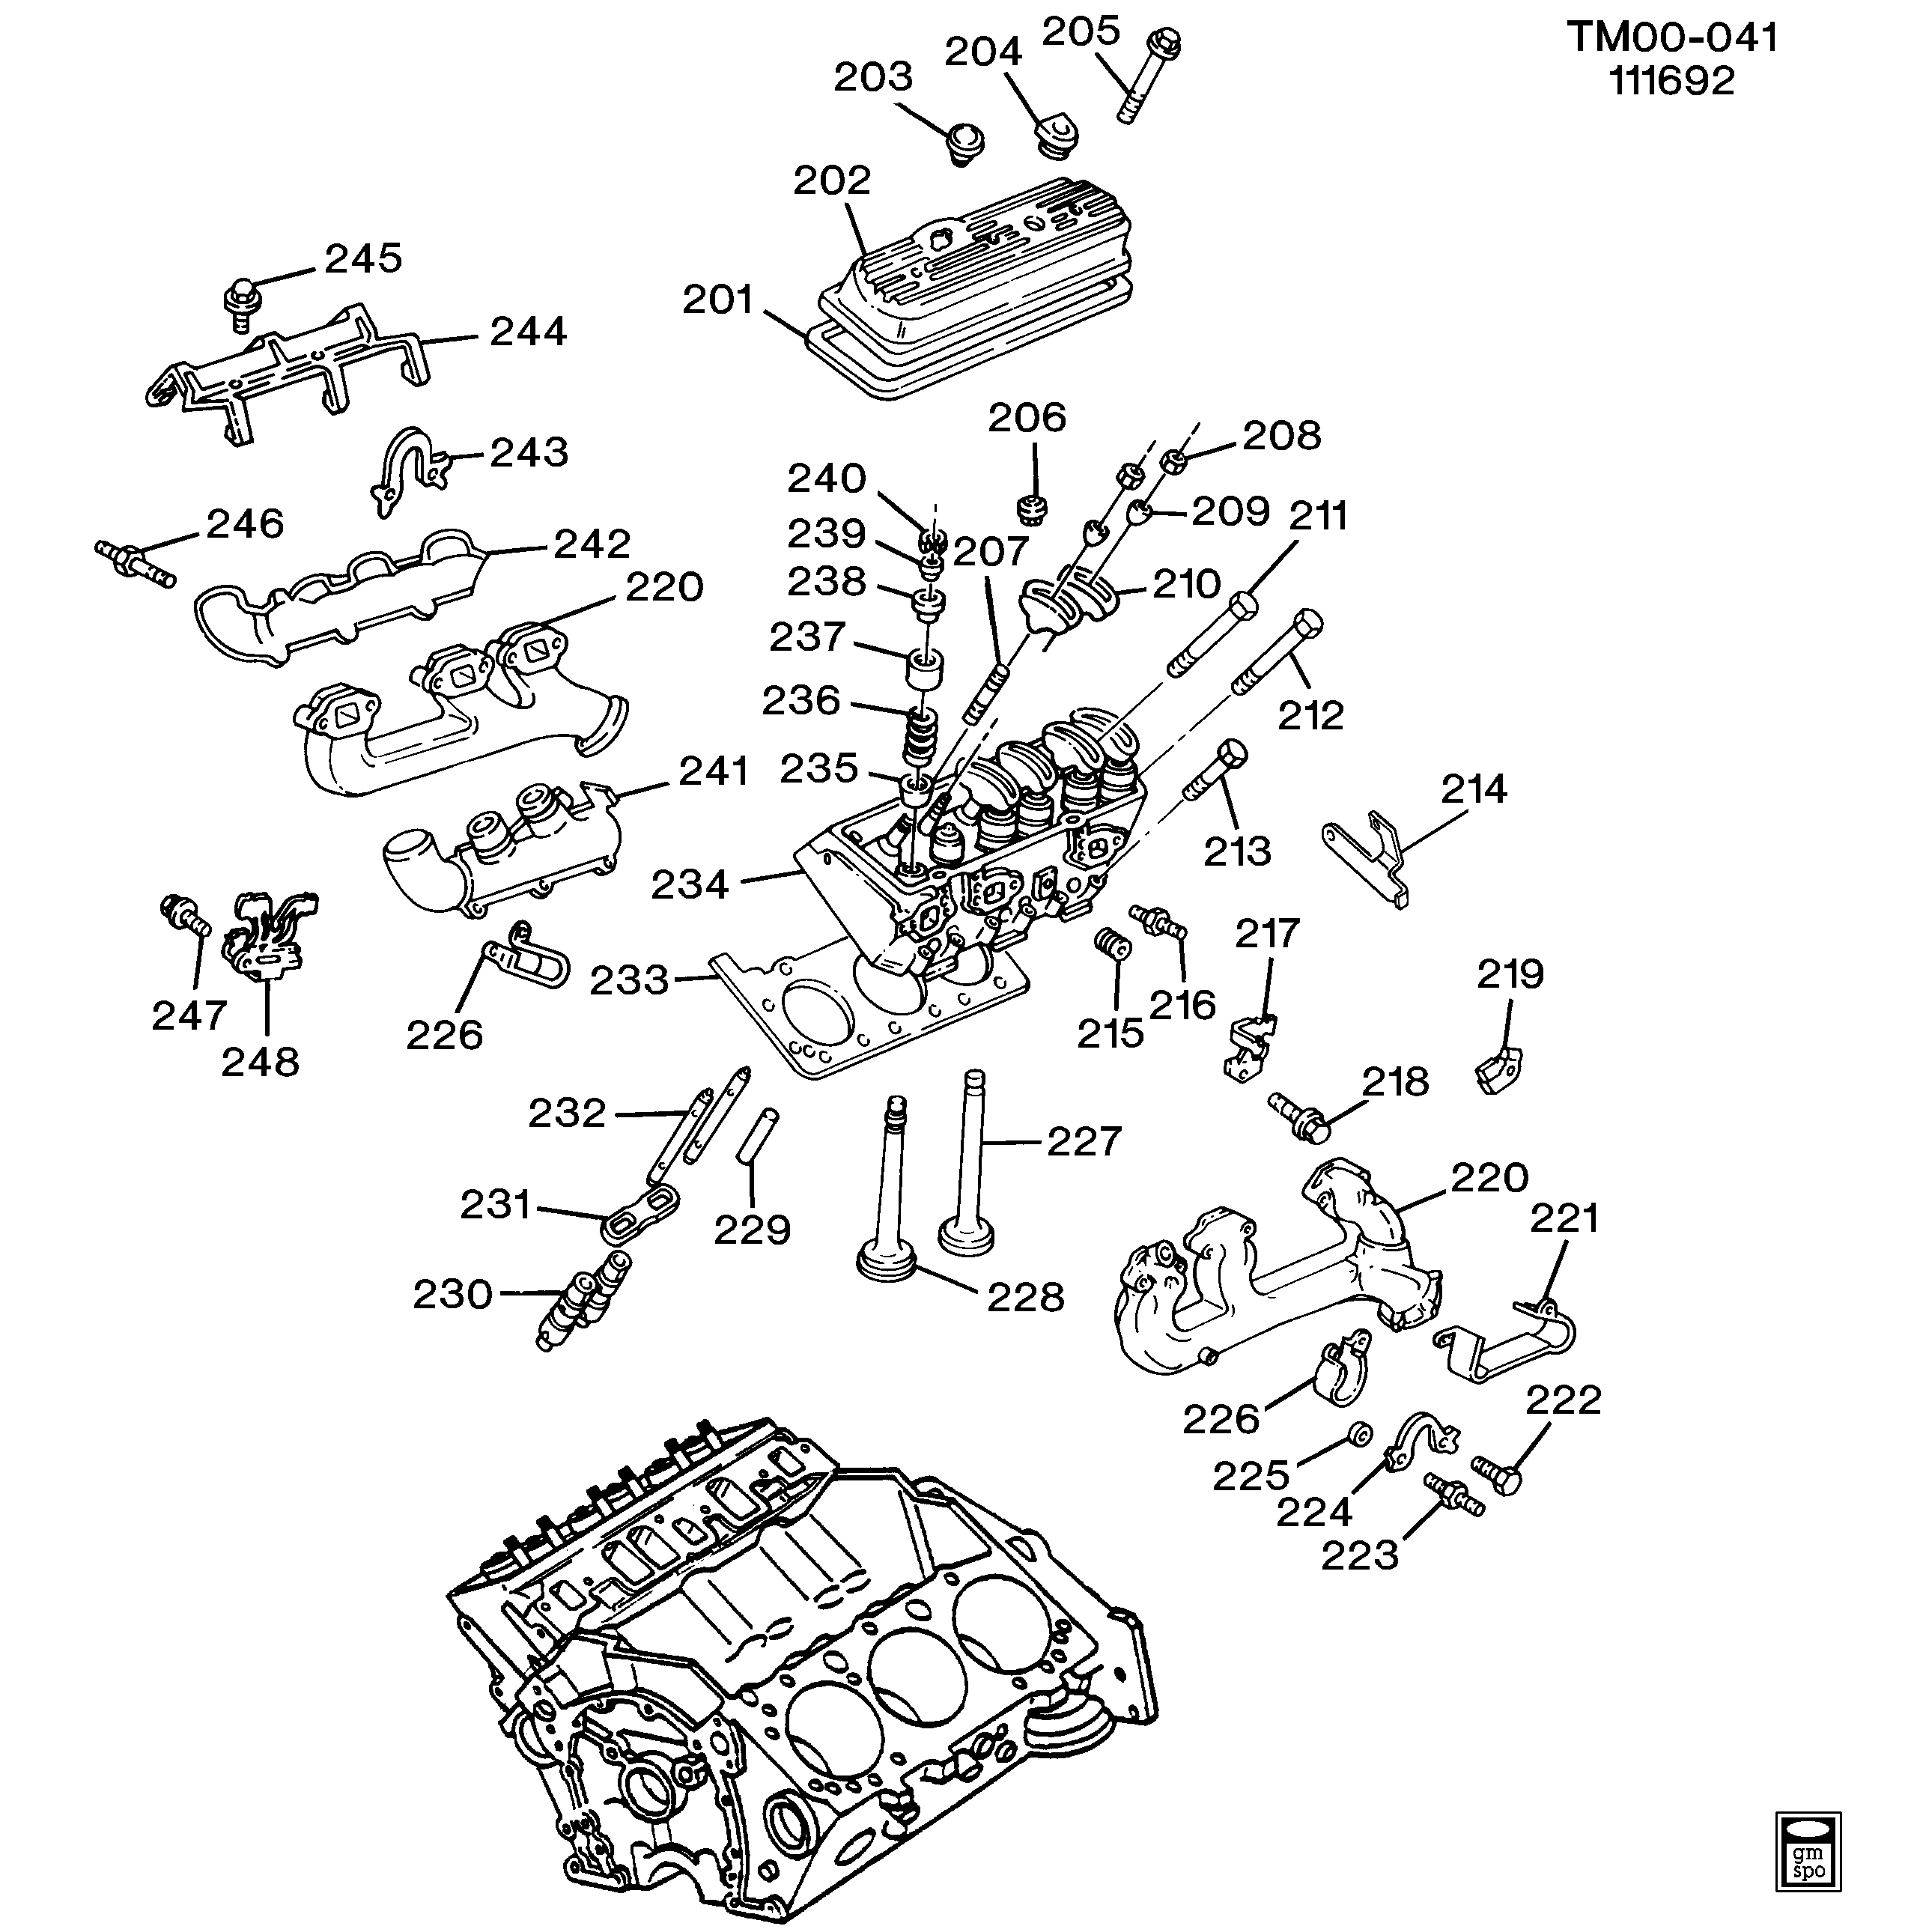 Chevy 4 3 V6 Engine Head Diagram